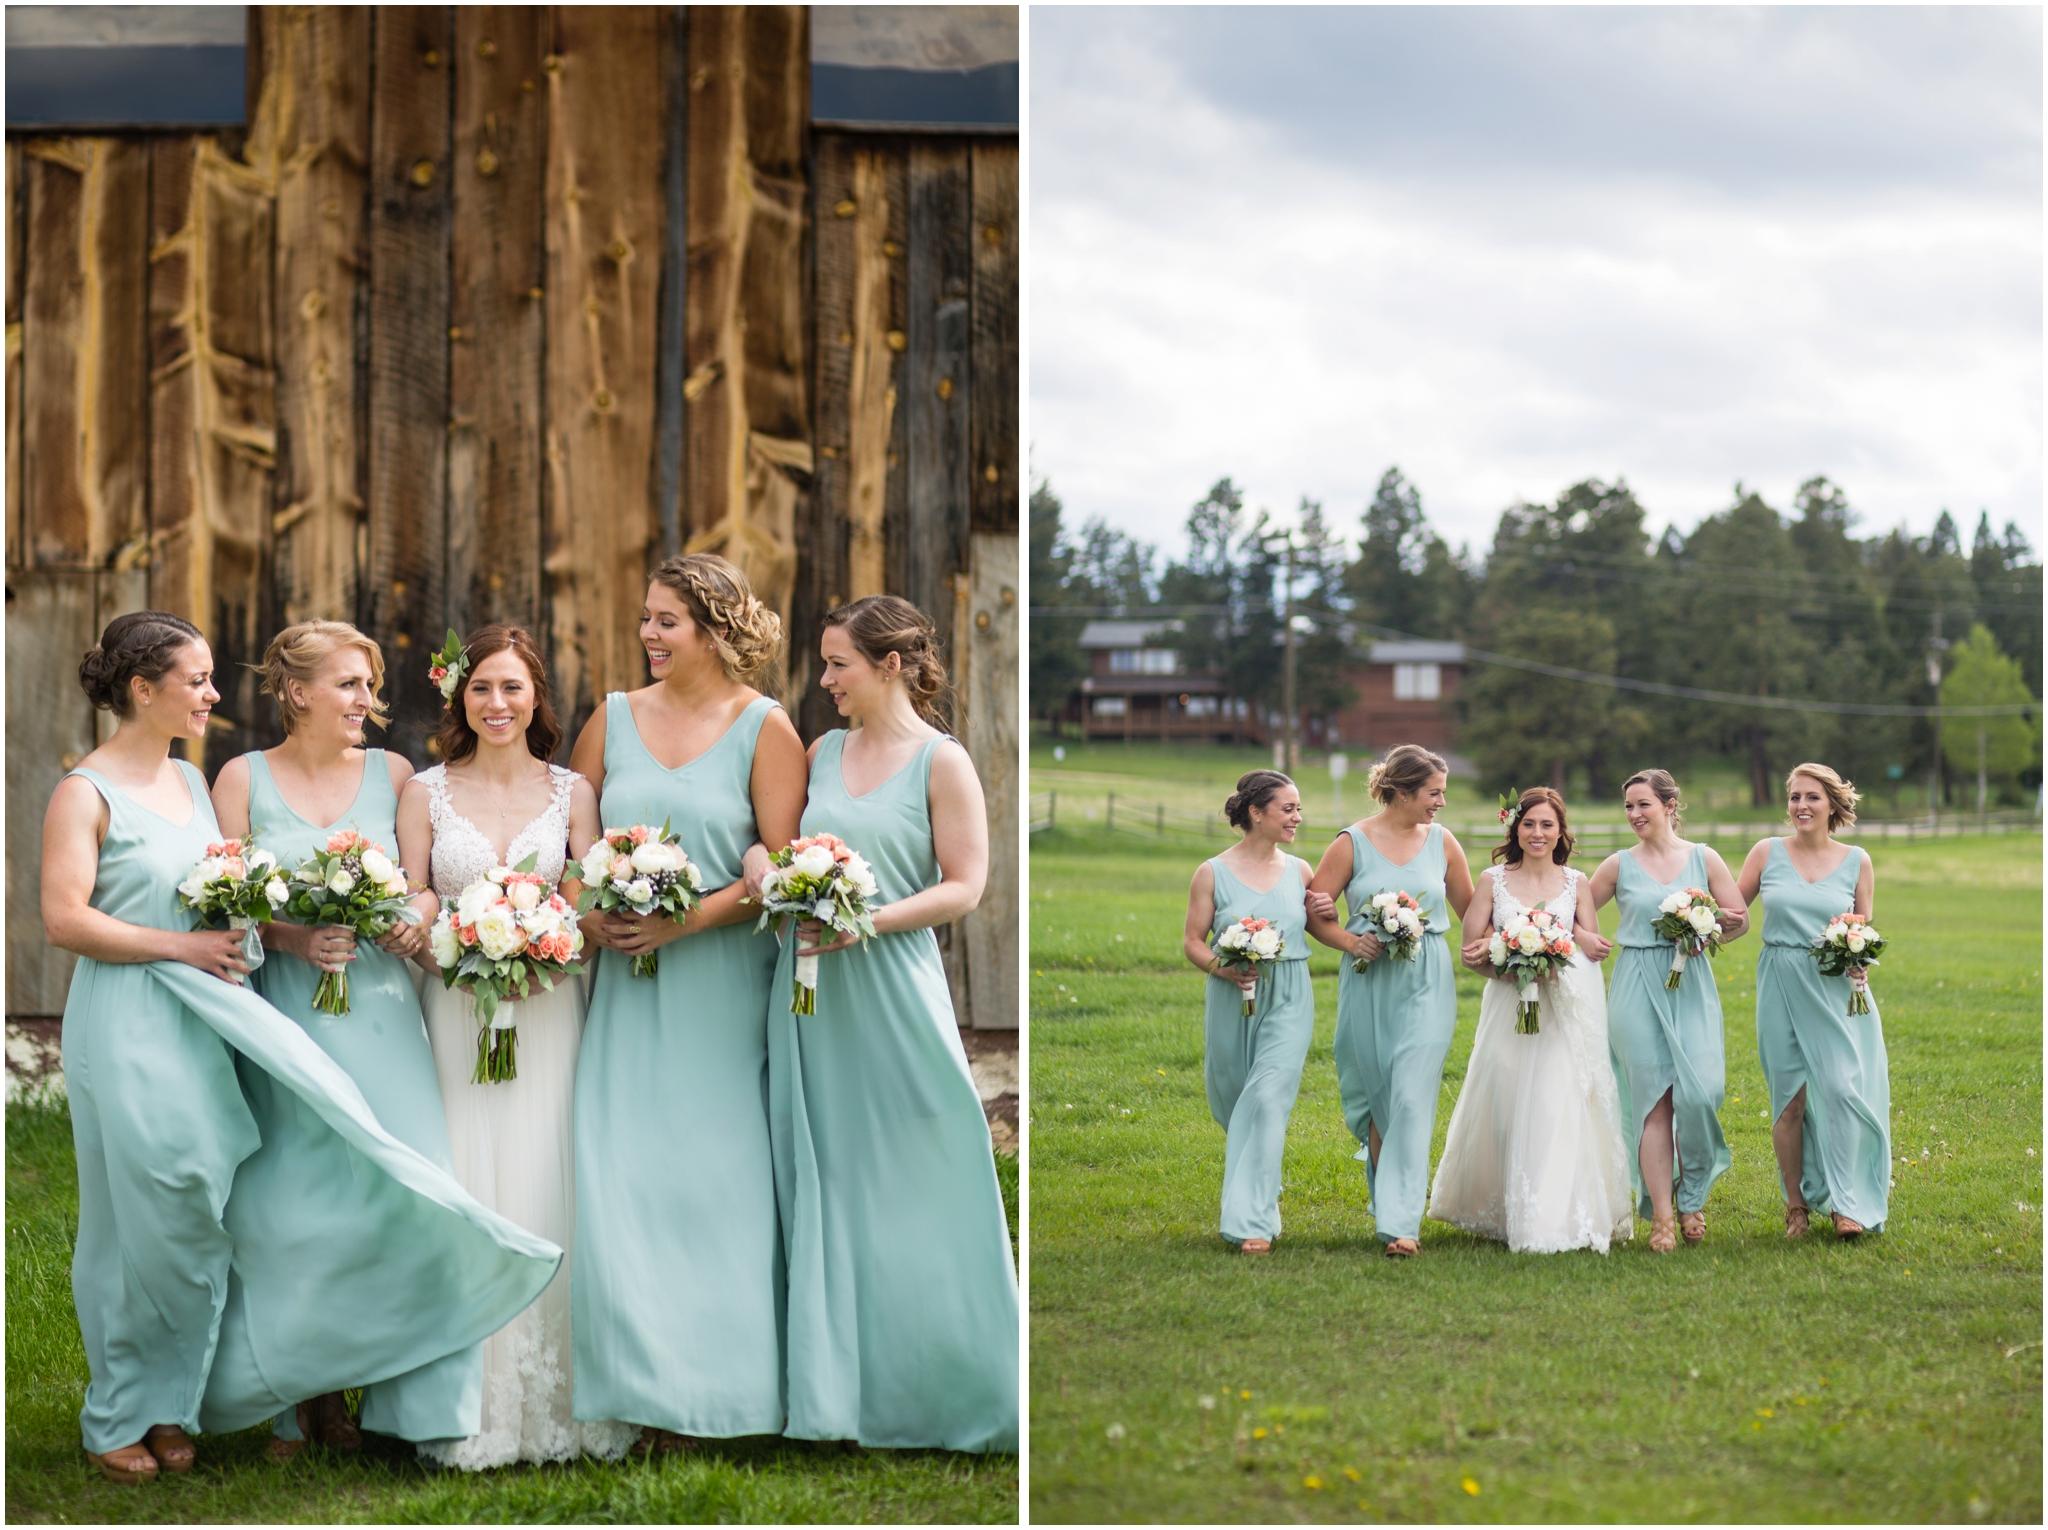 Evergreen_Lake_house_Wedding_Photographers_Bridesmaids.JPG